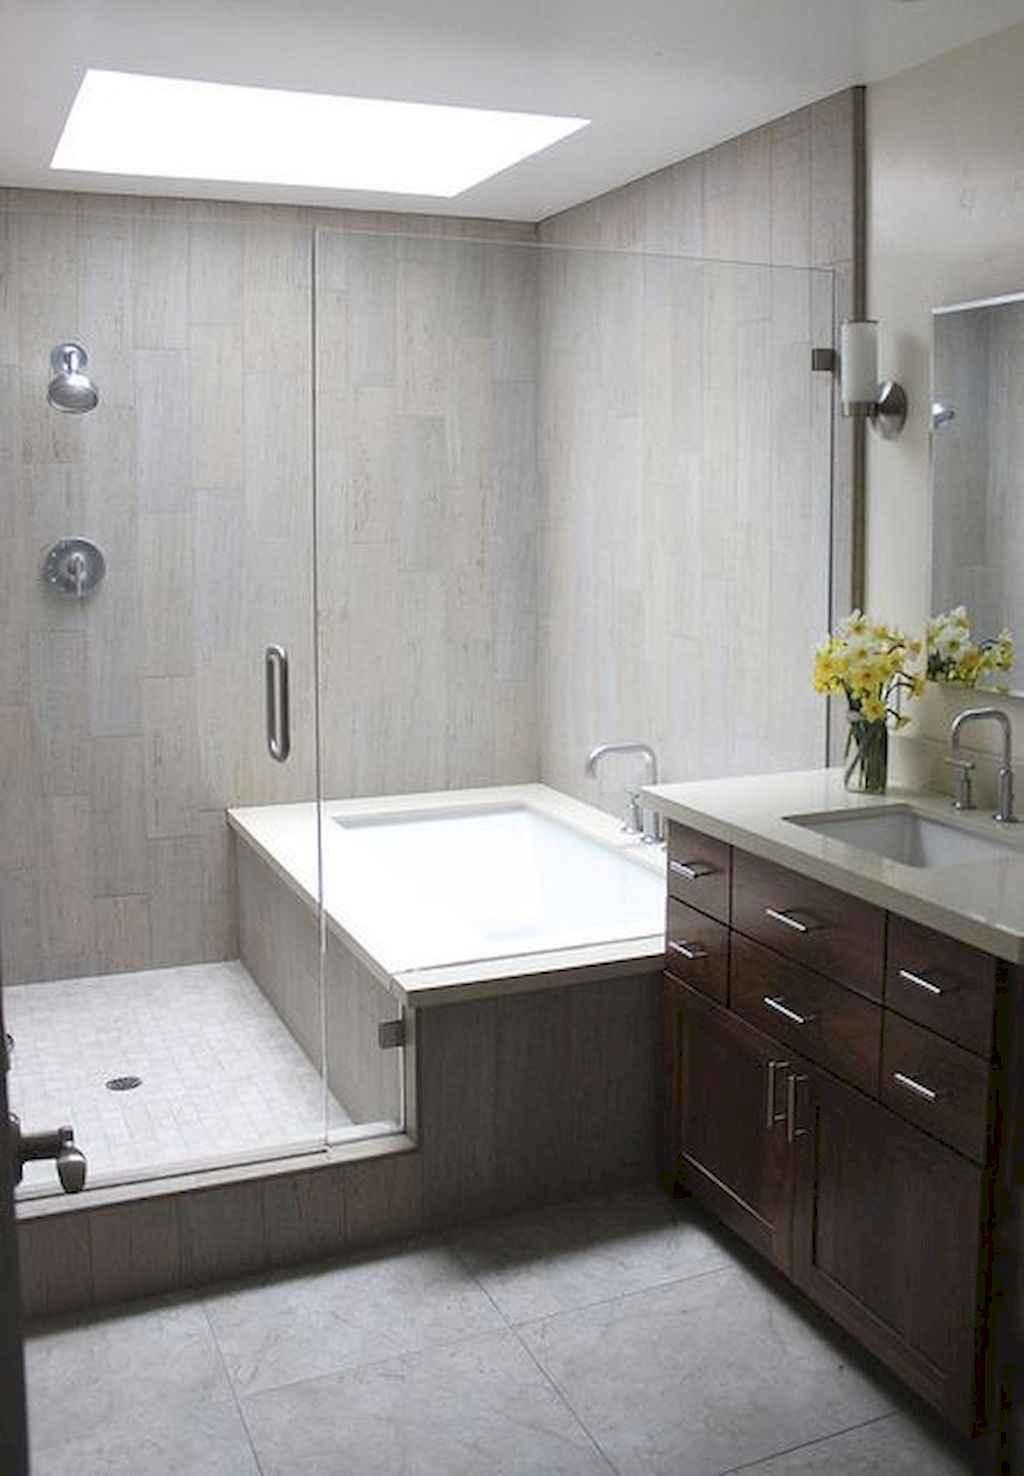 111 Brilliant Small Bathroom Remodel Ideas On A Budget (85)